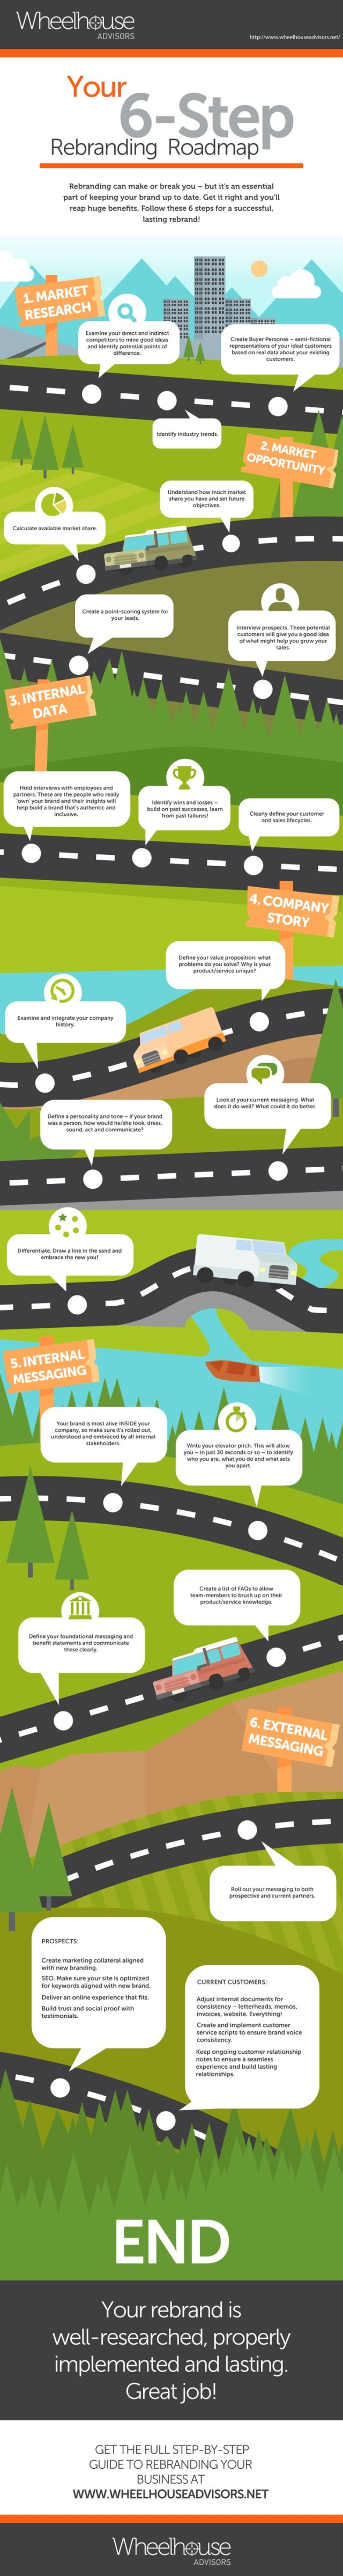 Rebranding in 2016 Follow This Rebranding Roadmap to Avoid Catastrophe